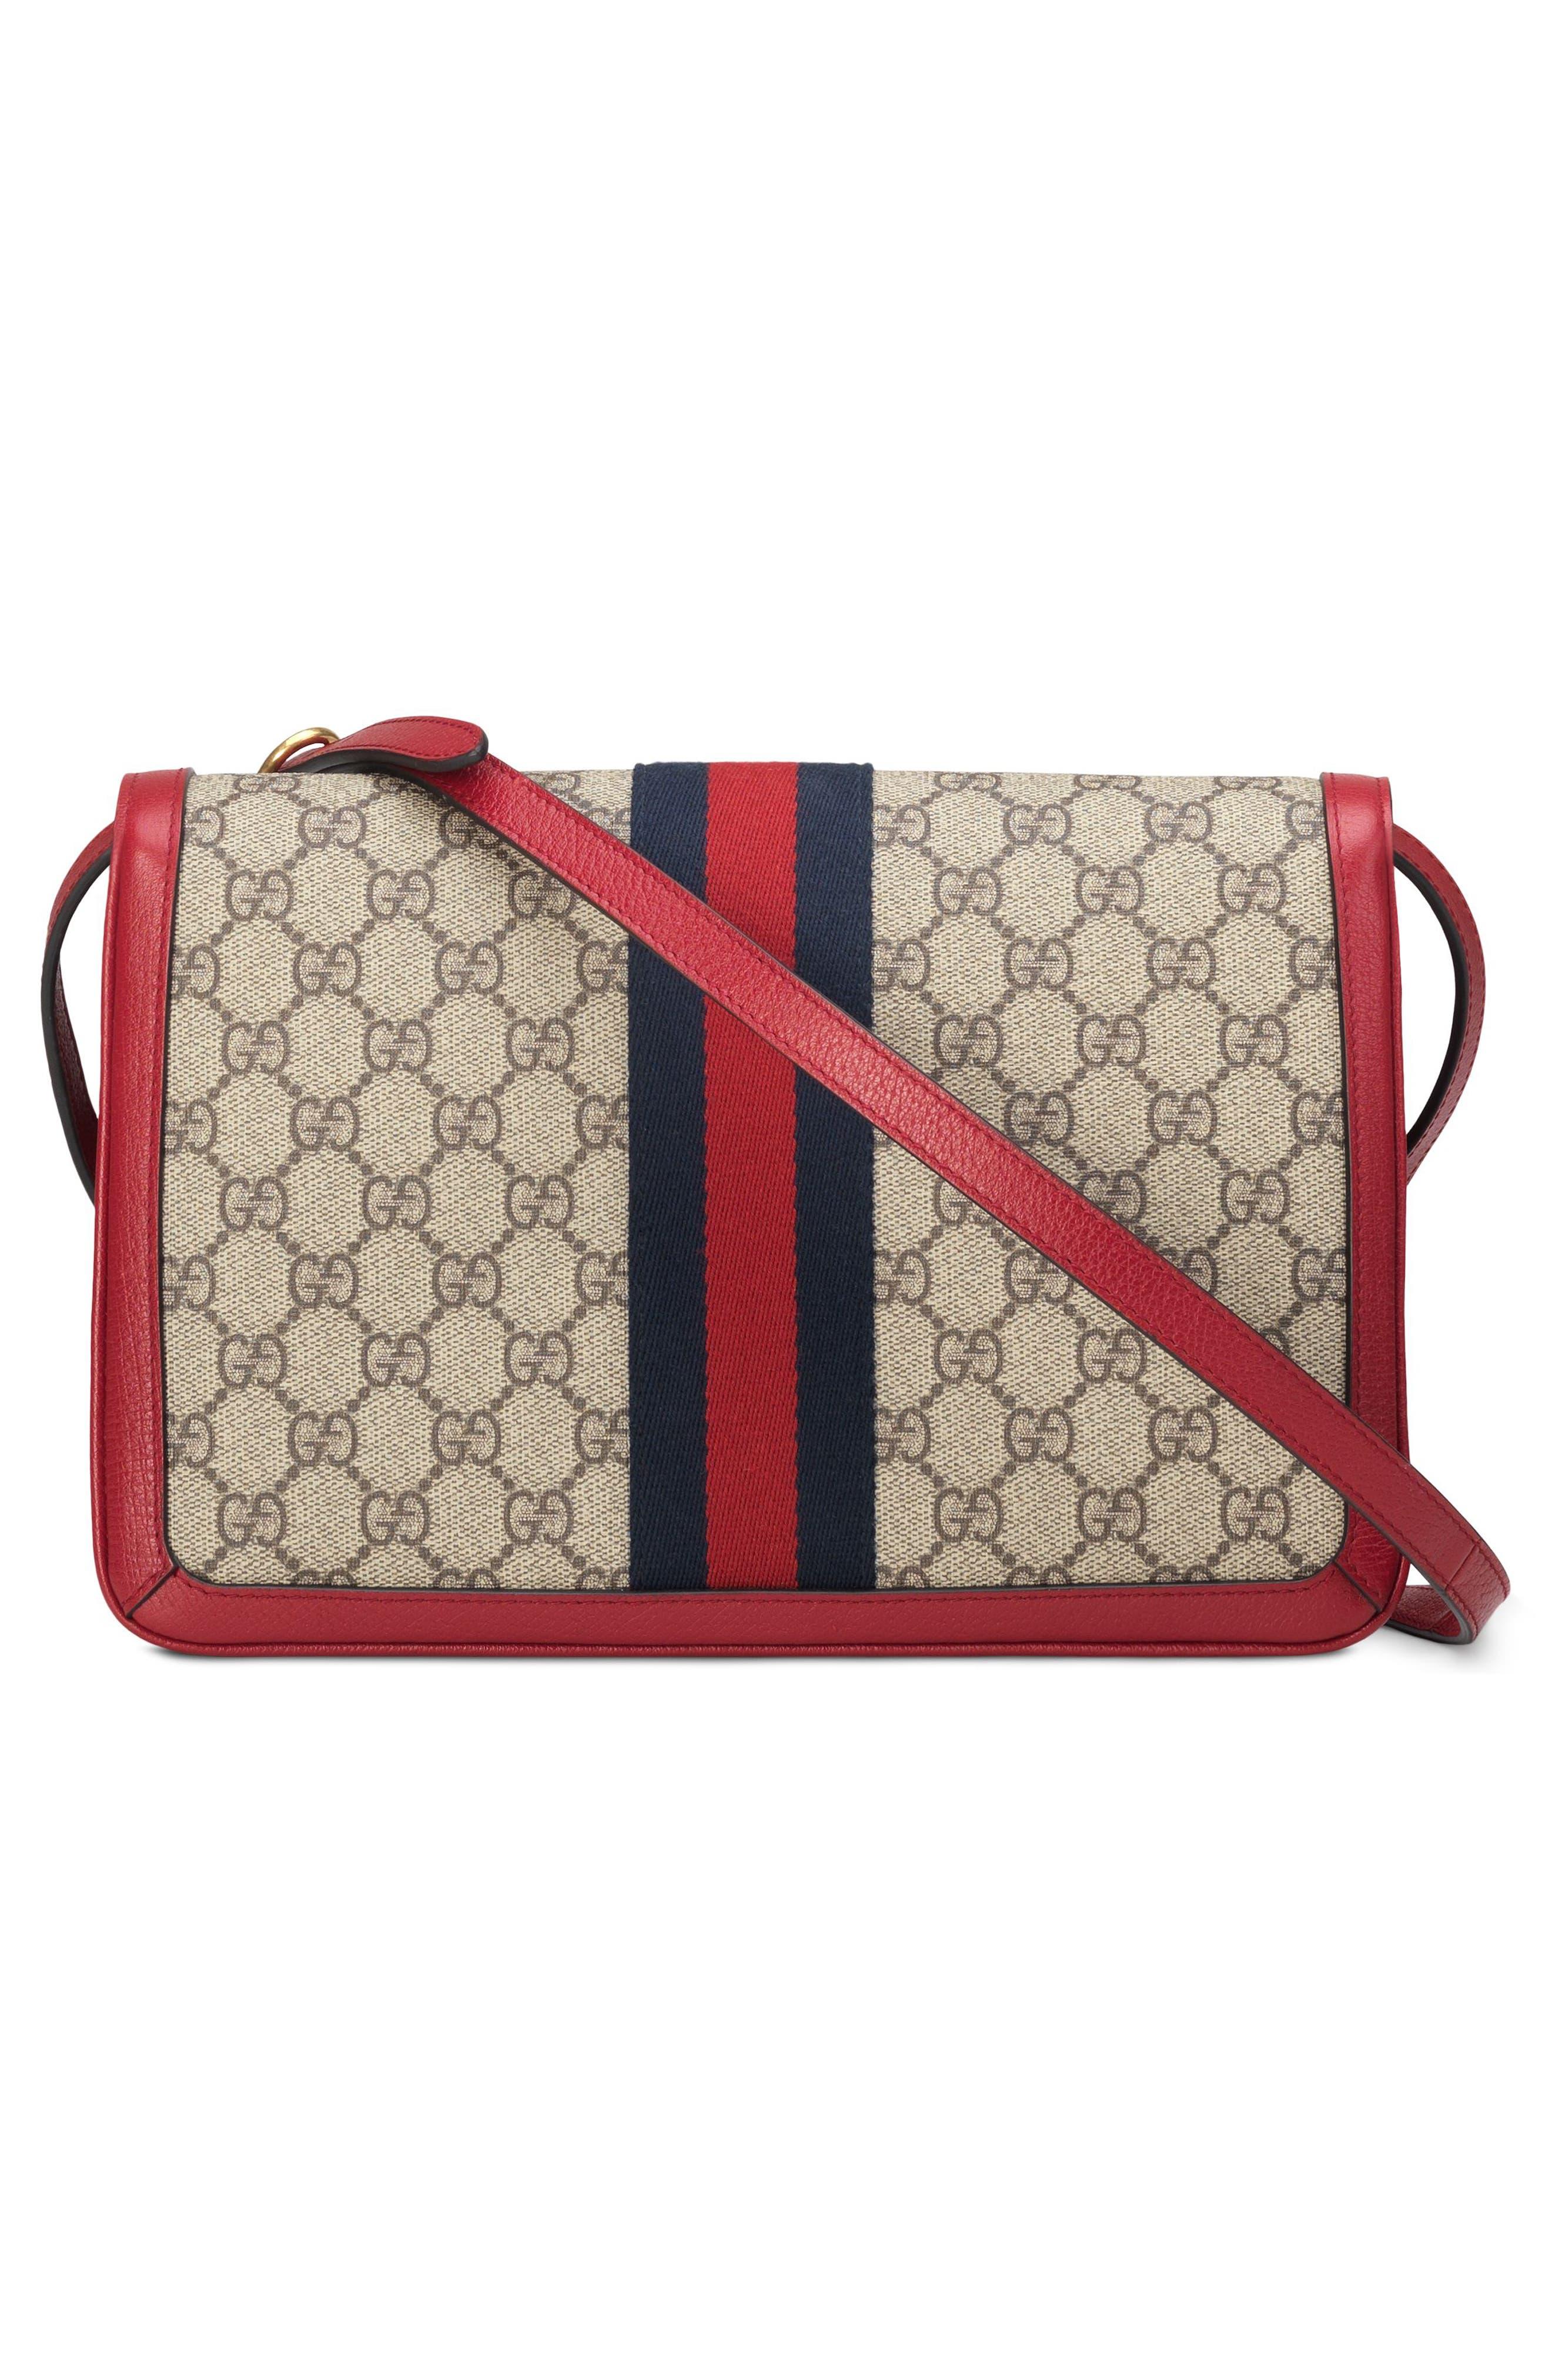 Queen Margaret GG Supreme Small Crossbody Bag,                             Alternate thumbnail 2, color,